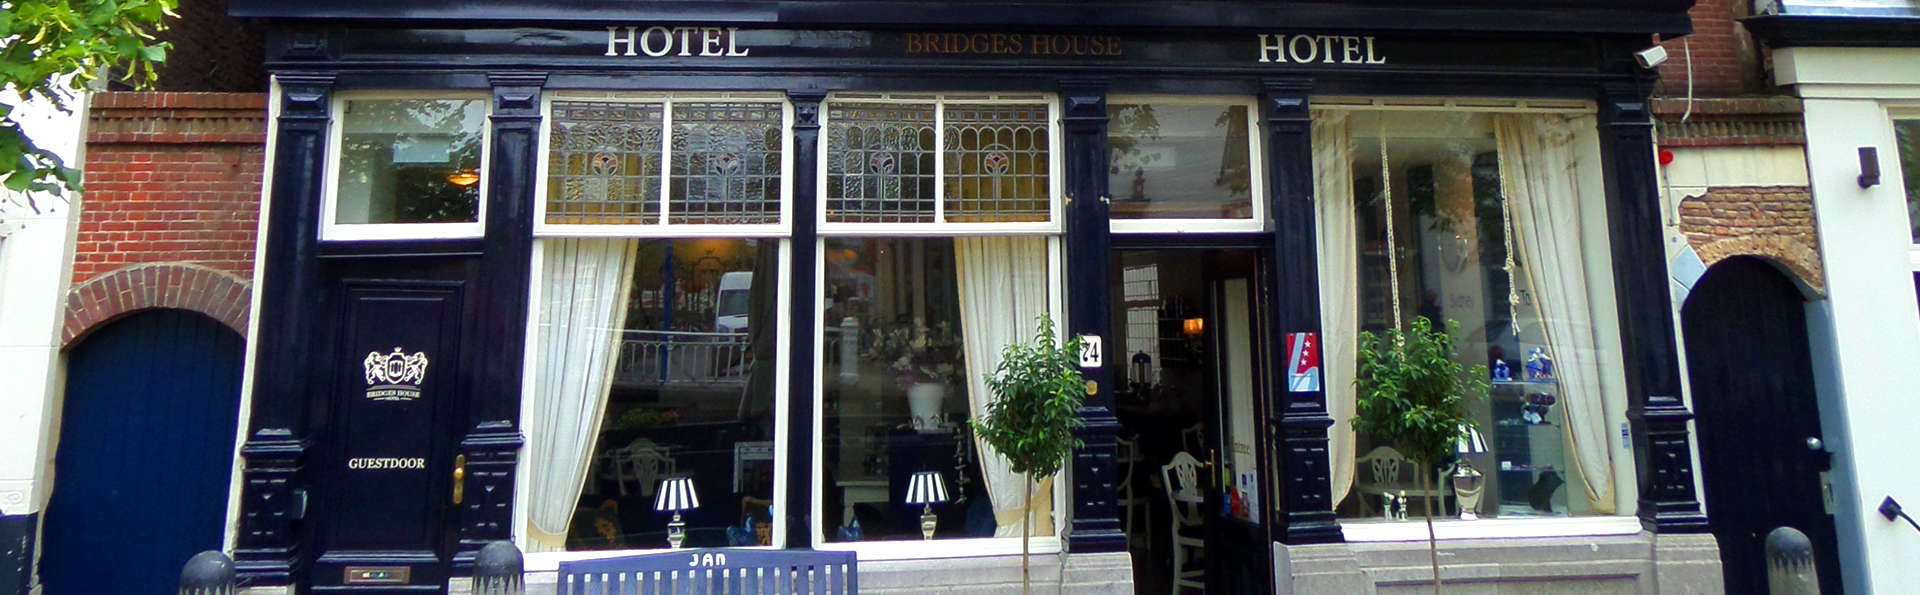 Hotel Bridges House - EDIT_Exterior2.jpg